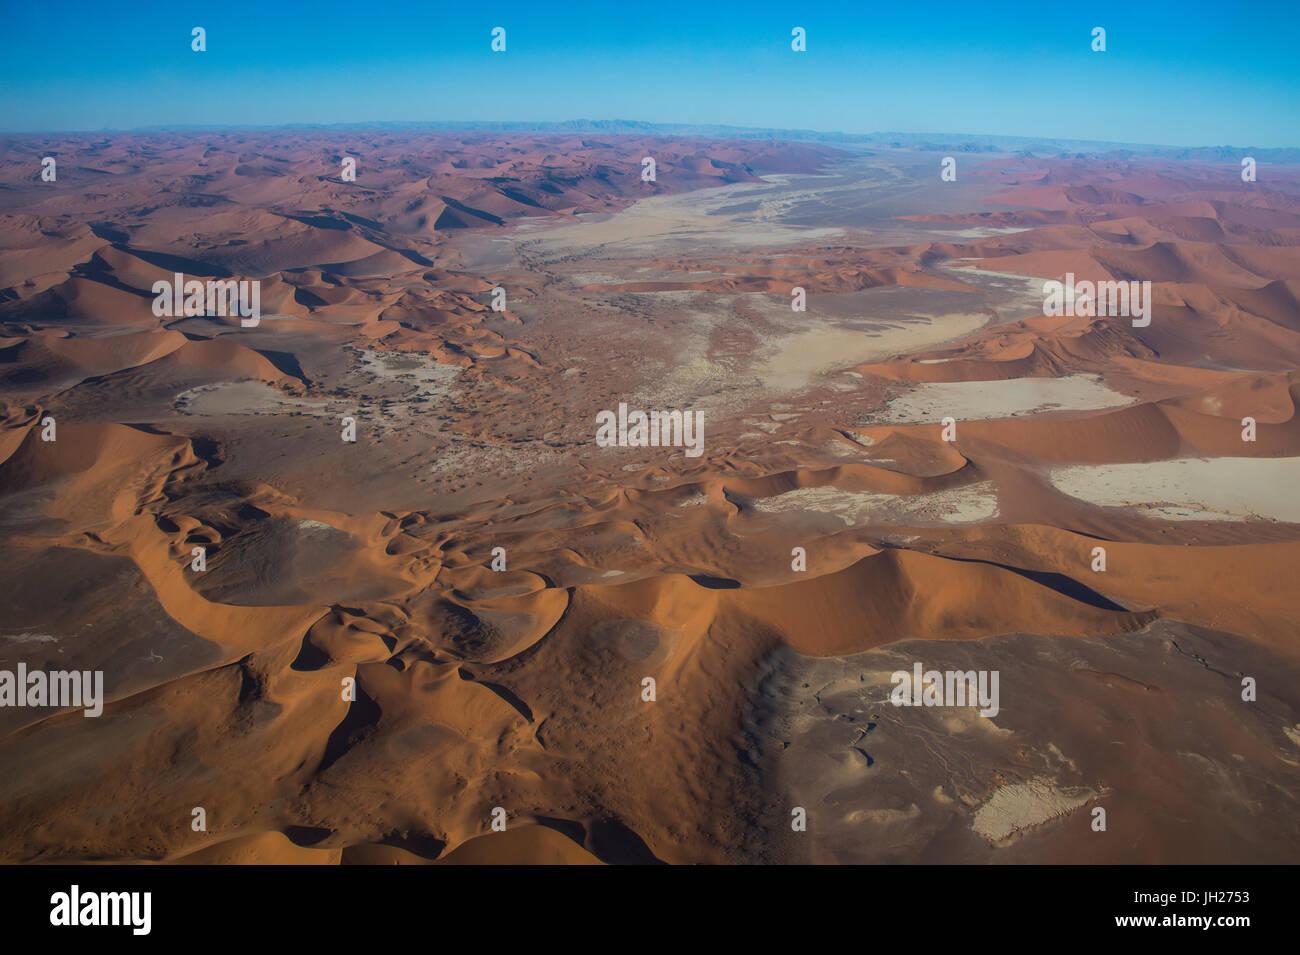 Antena de un lago muerto (vlei), en el desierto de Namib, Namibia, Africa Imagen De Stock